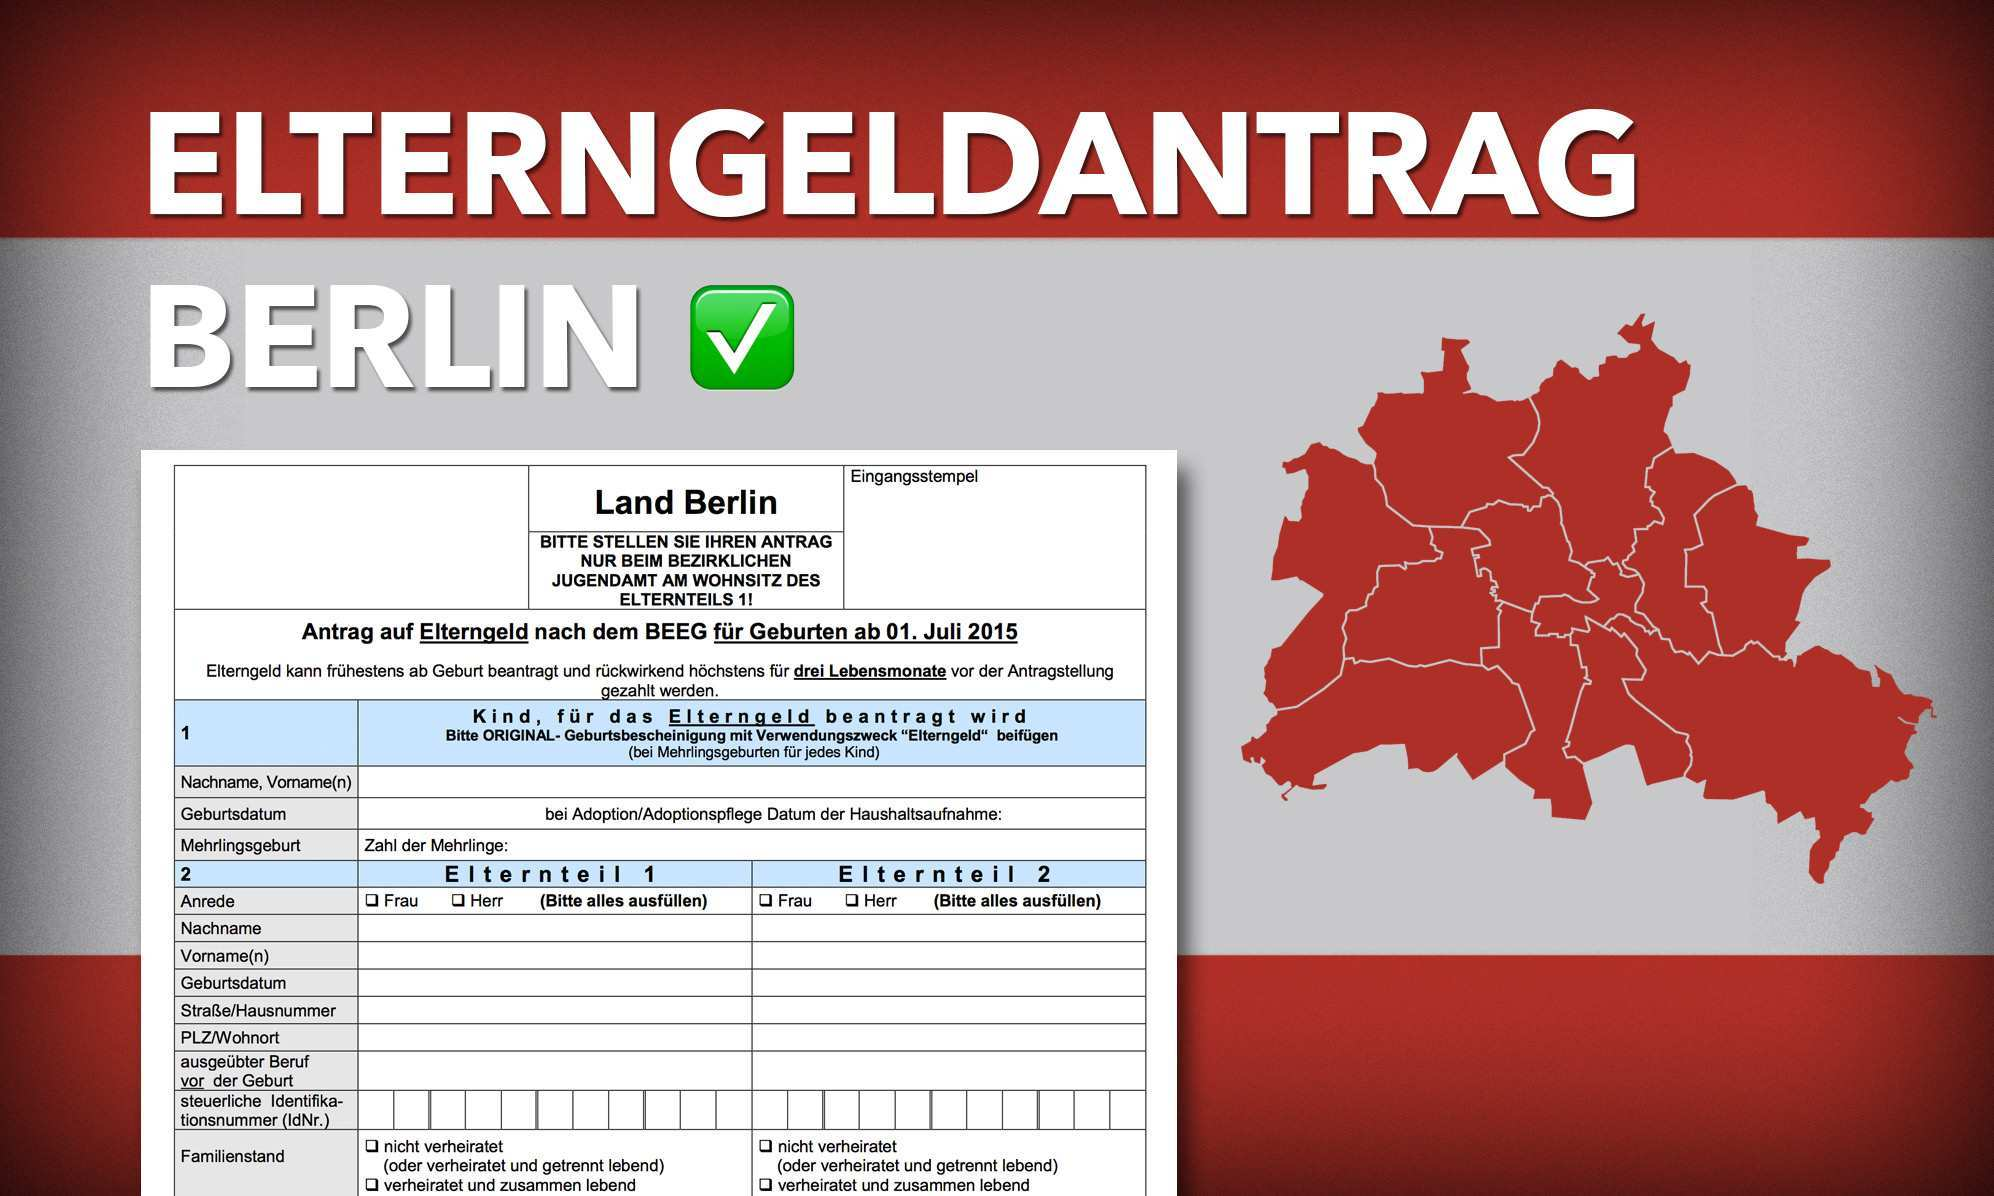 Elterngeldantrag Berlin 2021 Download Hilfe Tipps Fur Mehr Elterngeld